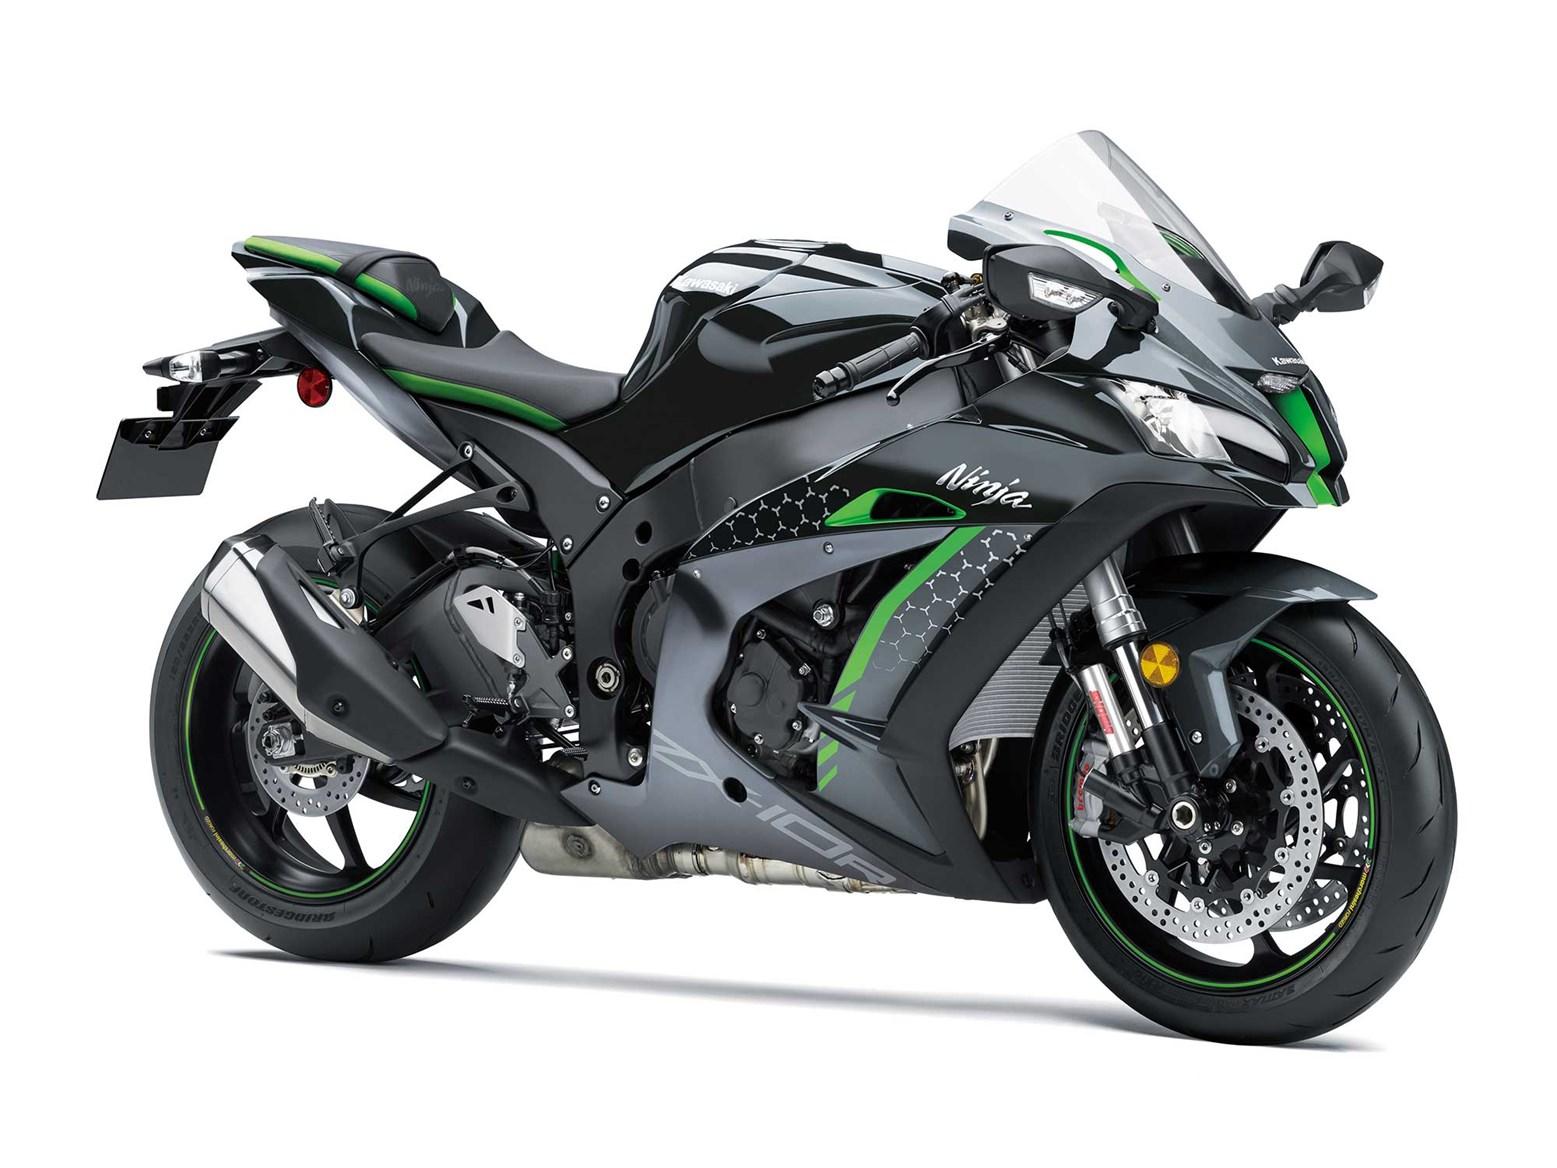 2019 Kawasaki Ninja Zx 10r More Power Bikesrepublic